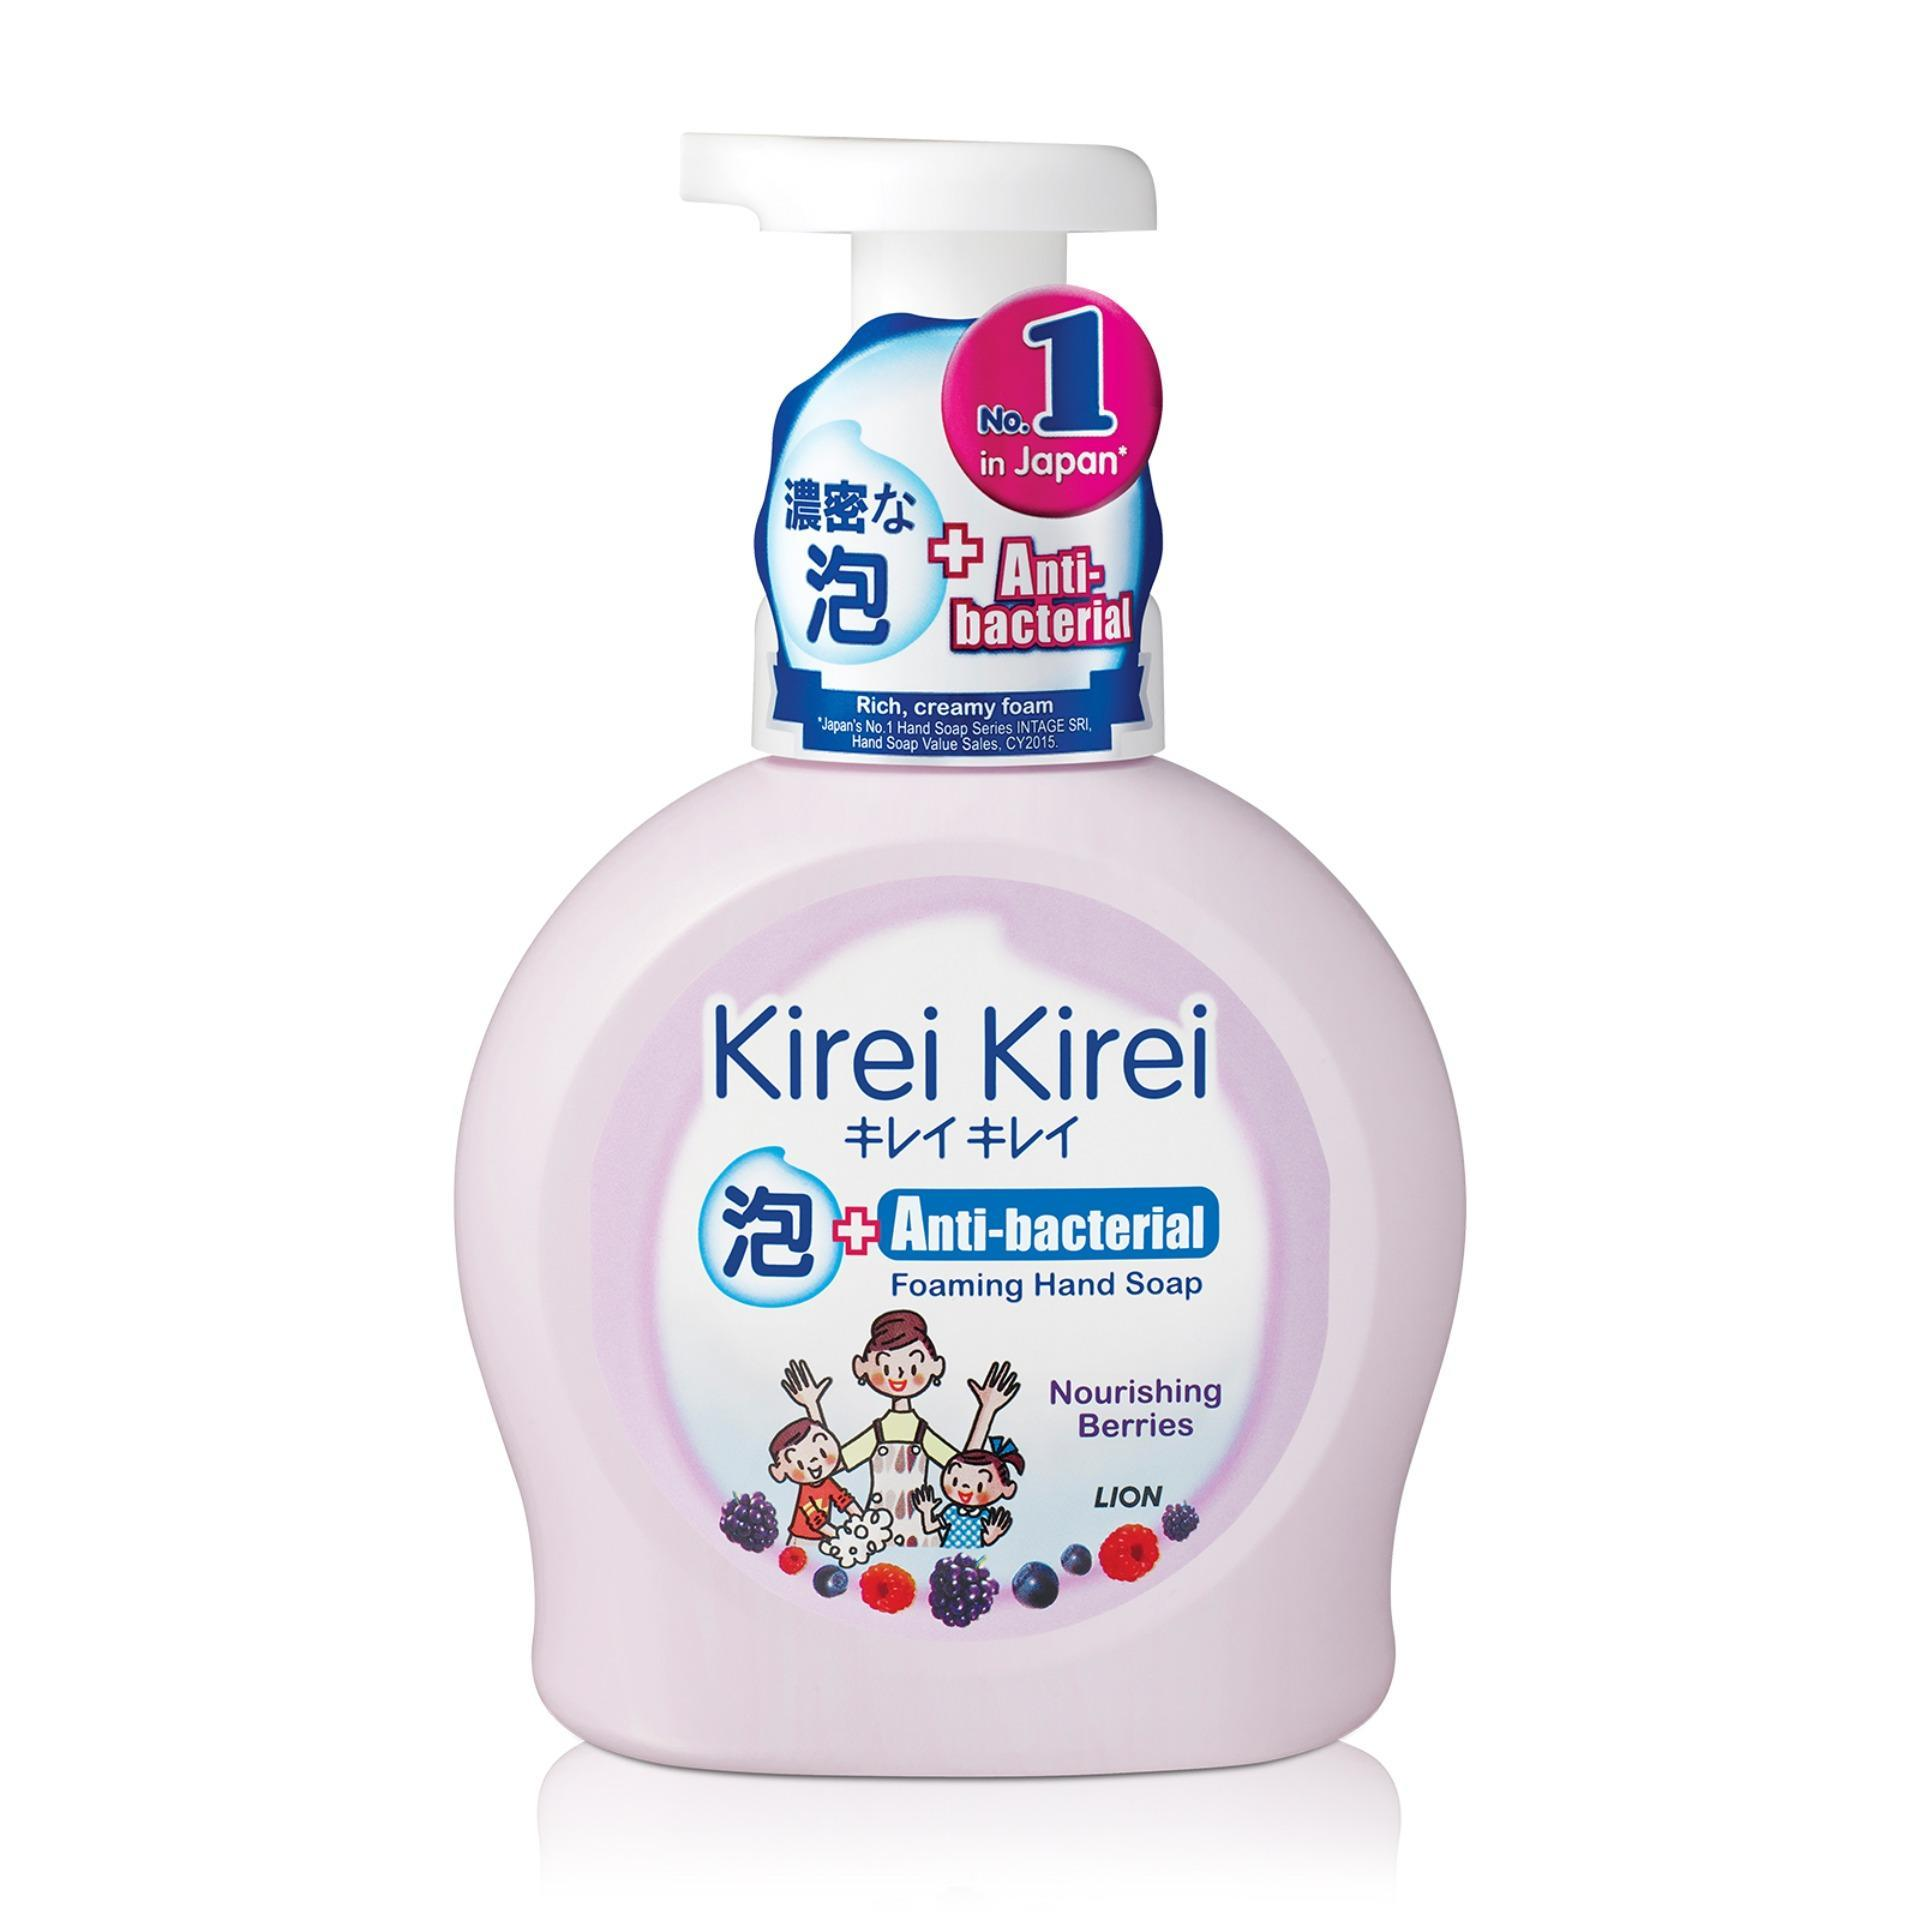 Bọt rửa tay Kirei Kirei hương dâu tằm 450ml